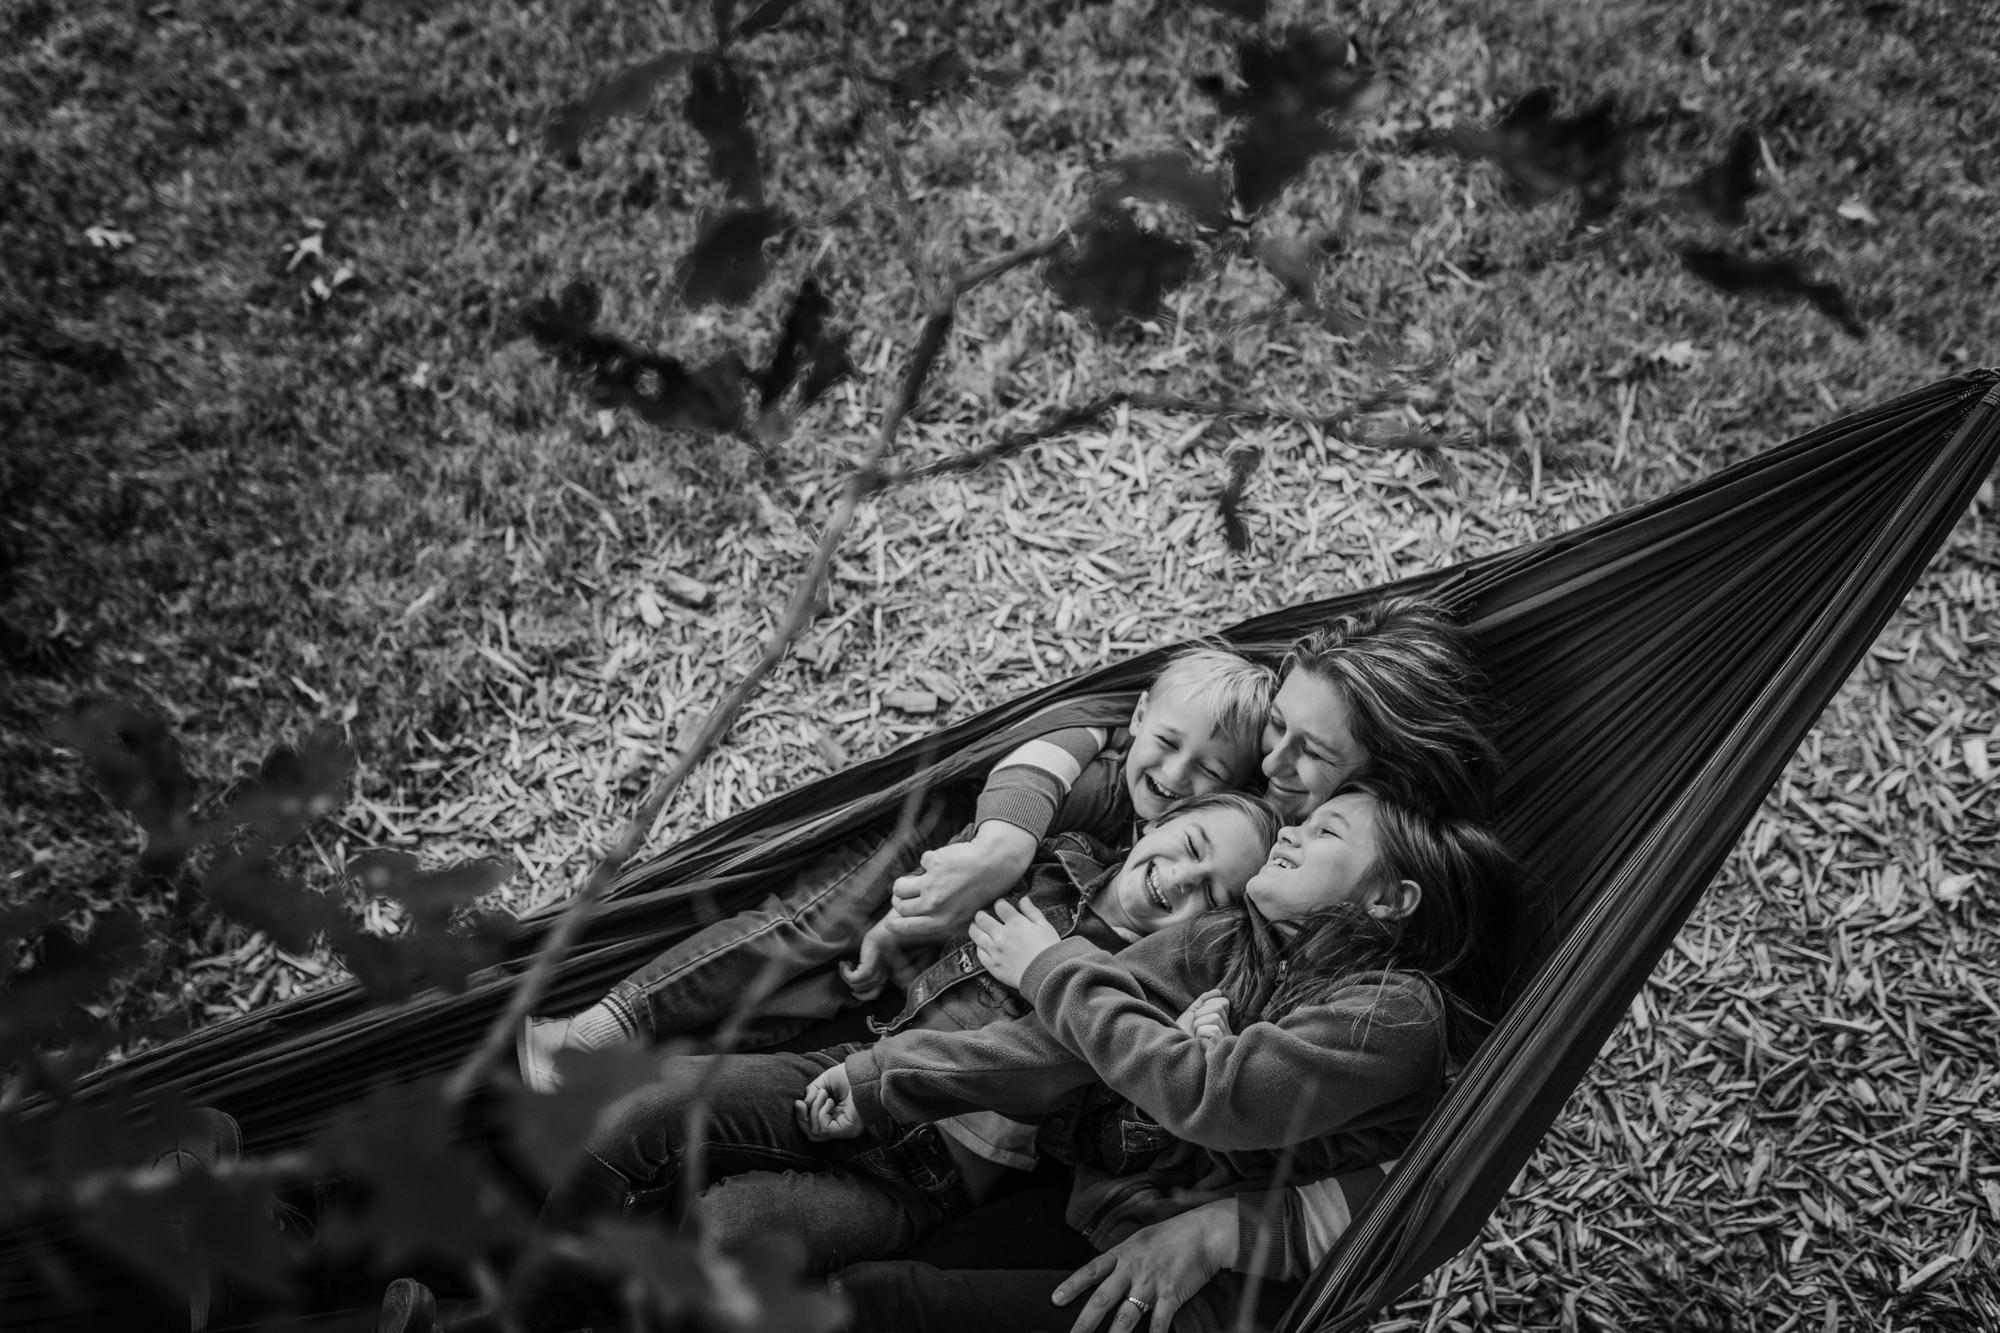 denver_colorado_documentary_lori_mack_photography20171028-4D5A4776.jpg